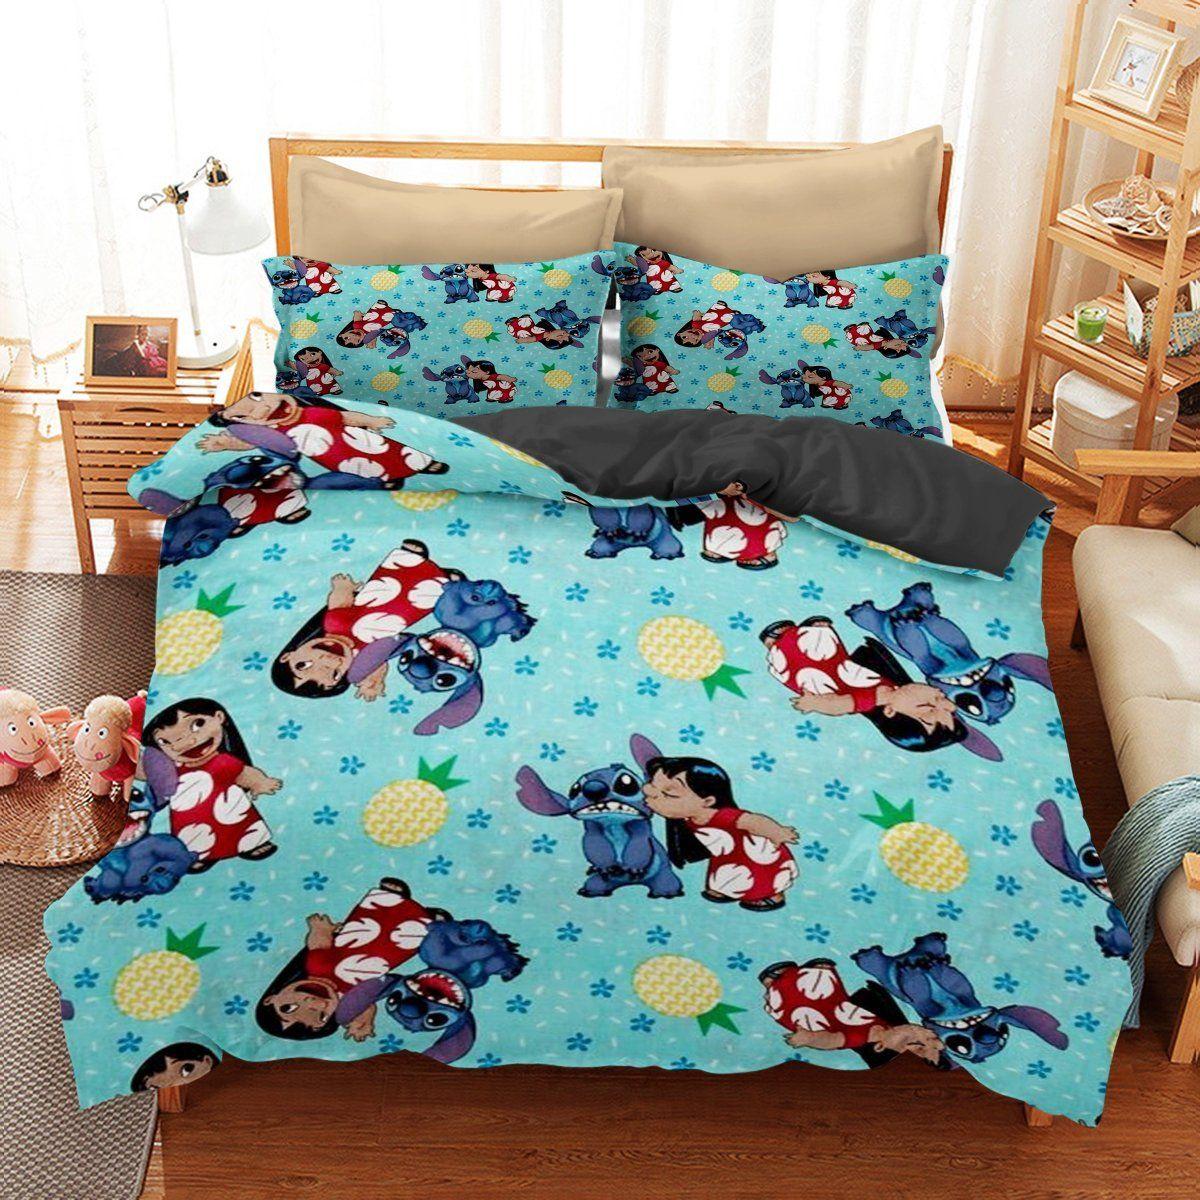 Bedding set stitch and lilo funny gift idea